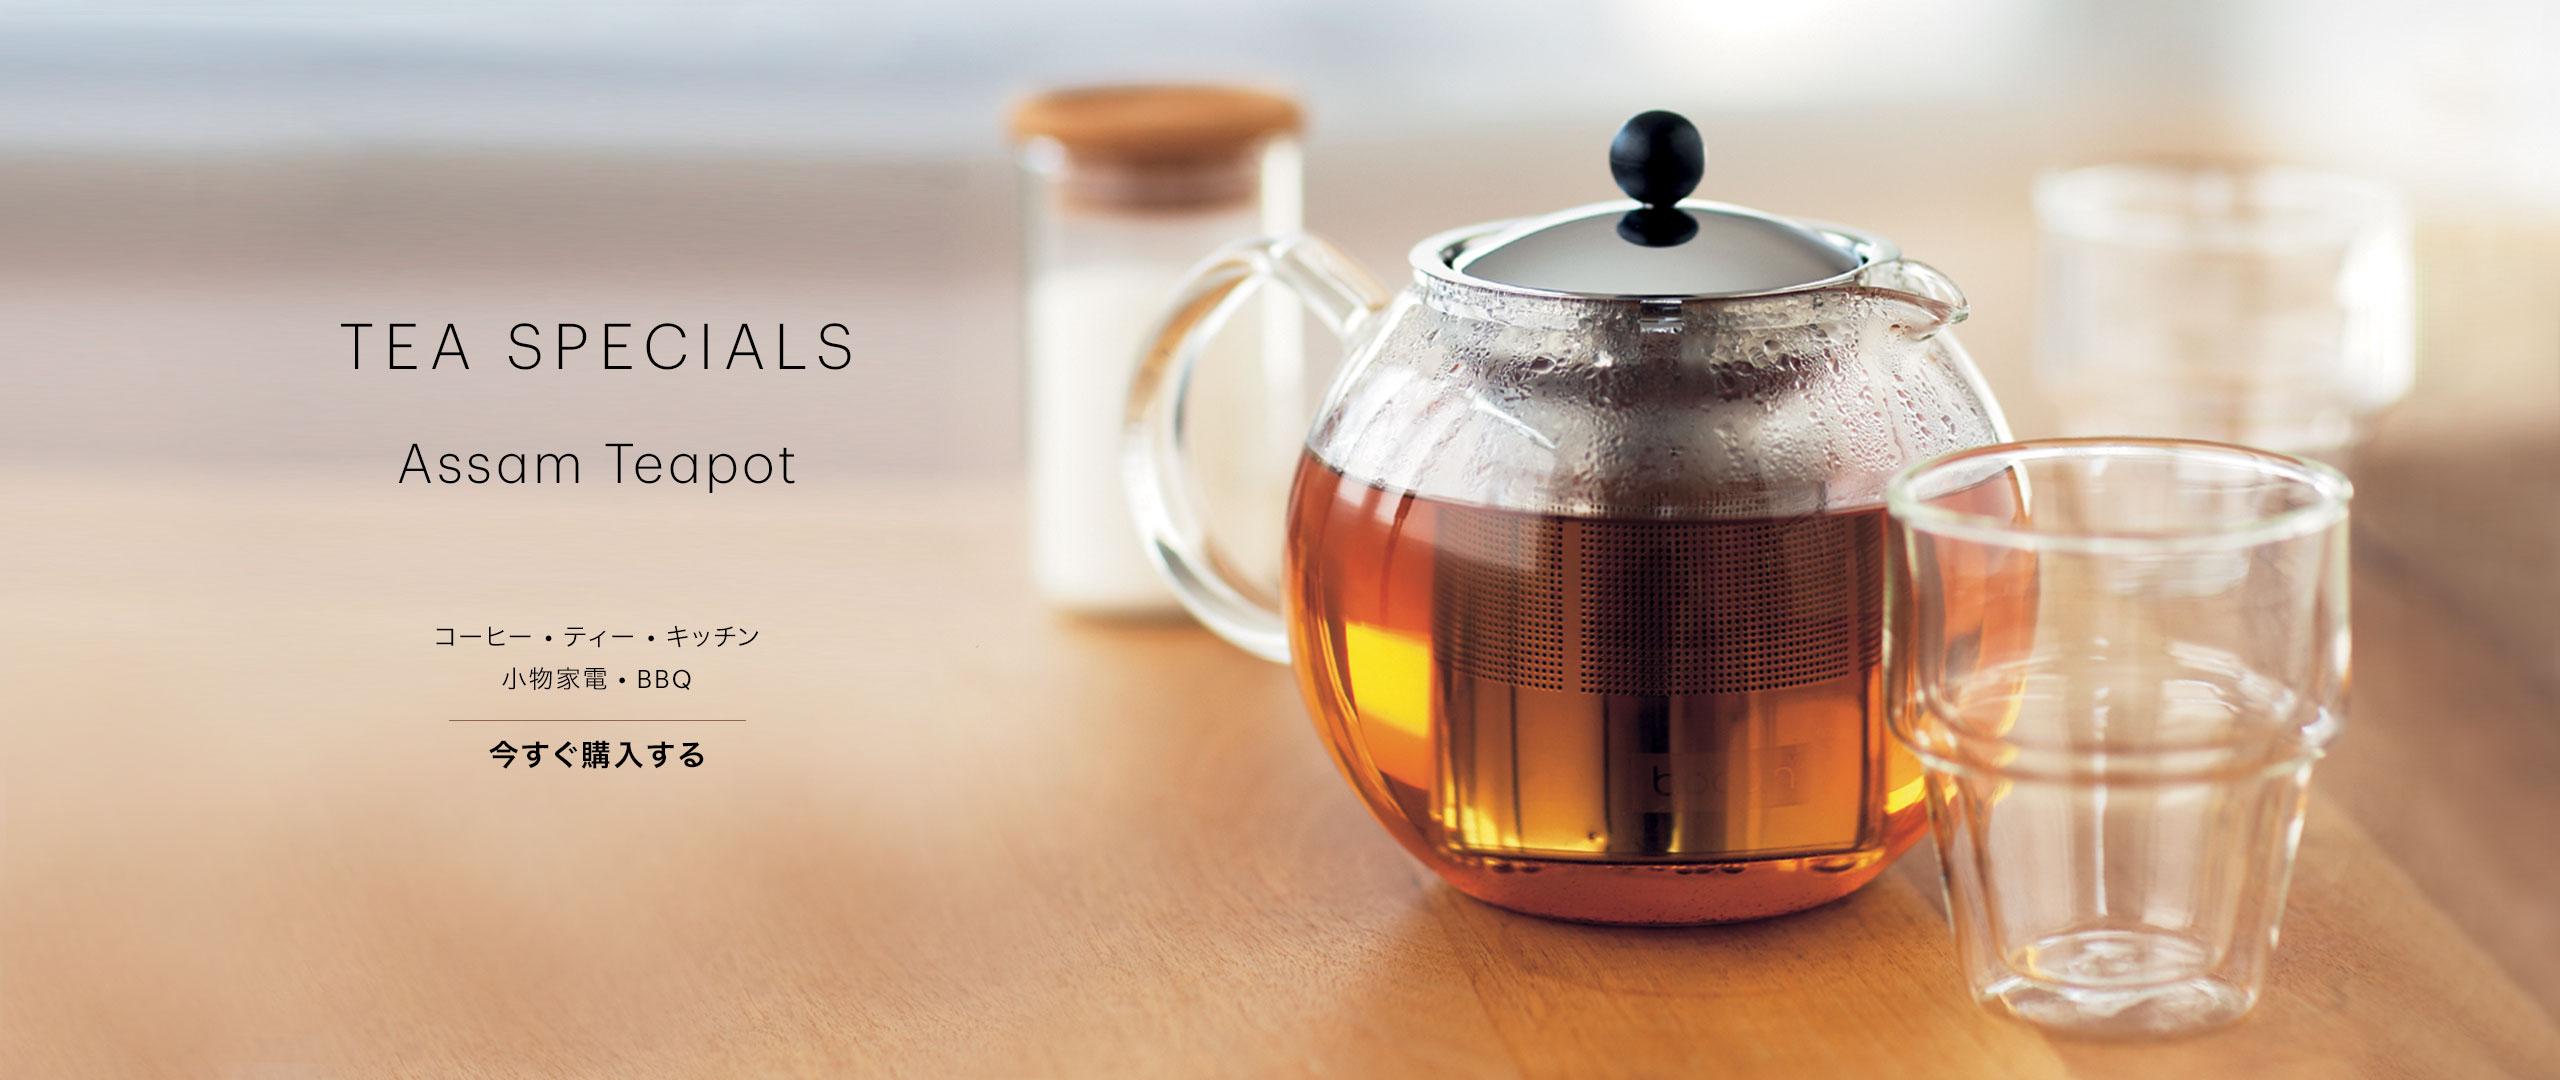 BJP - Tea Specials